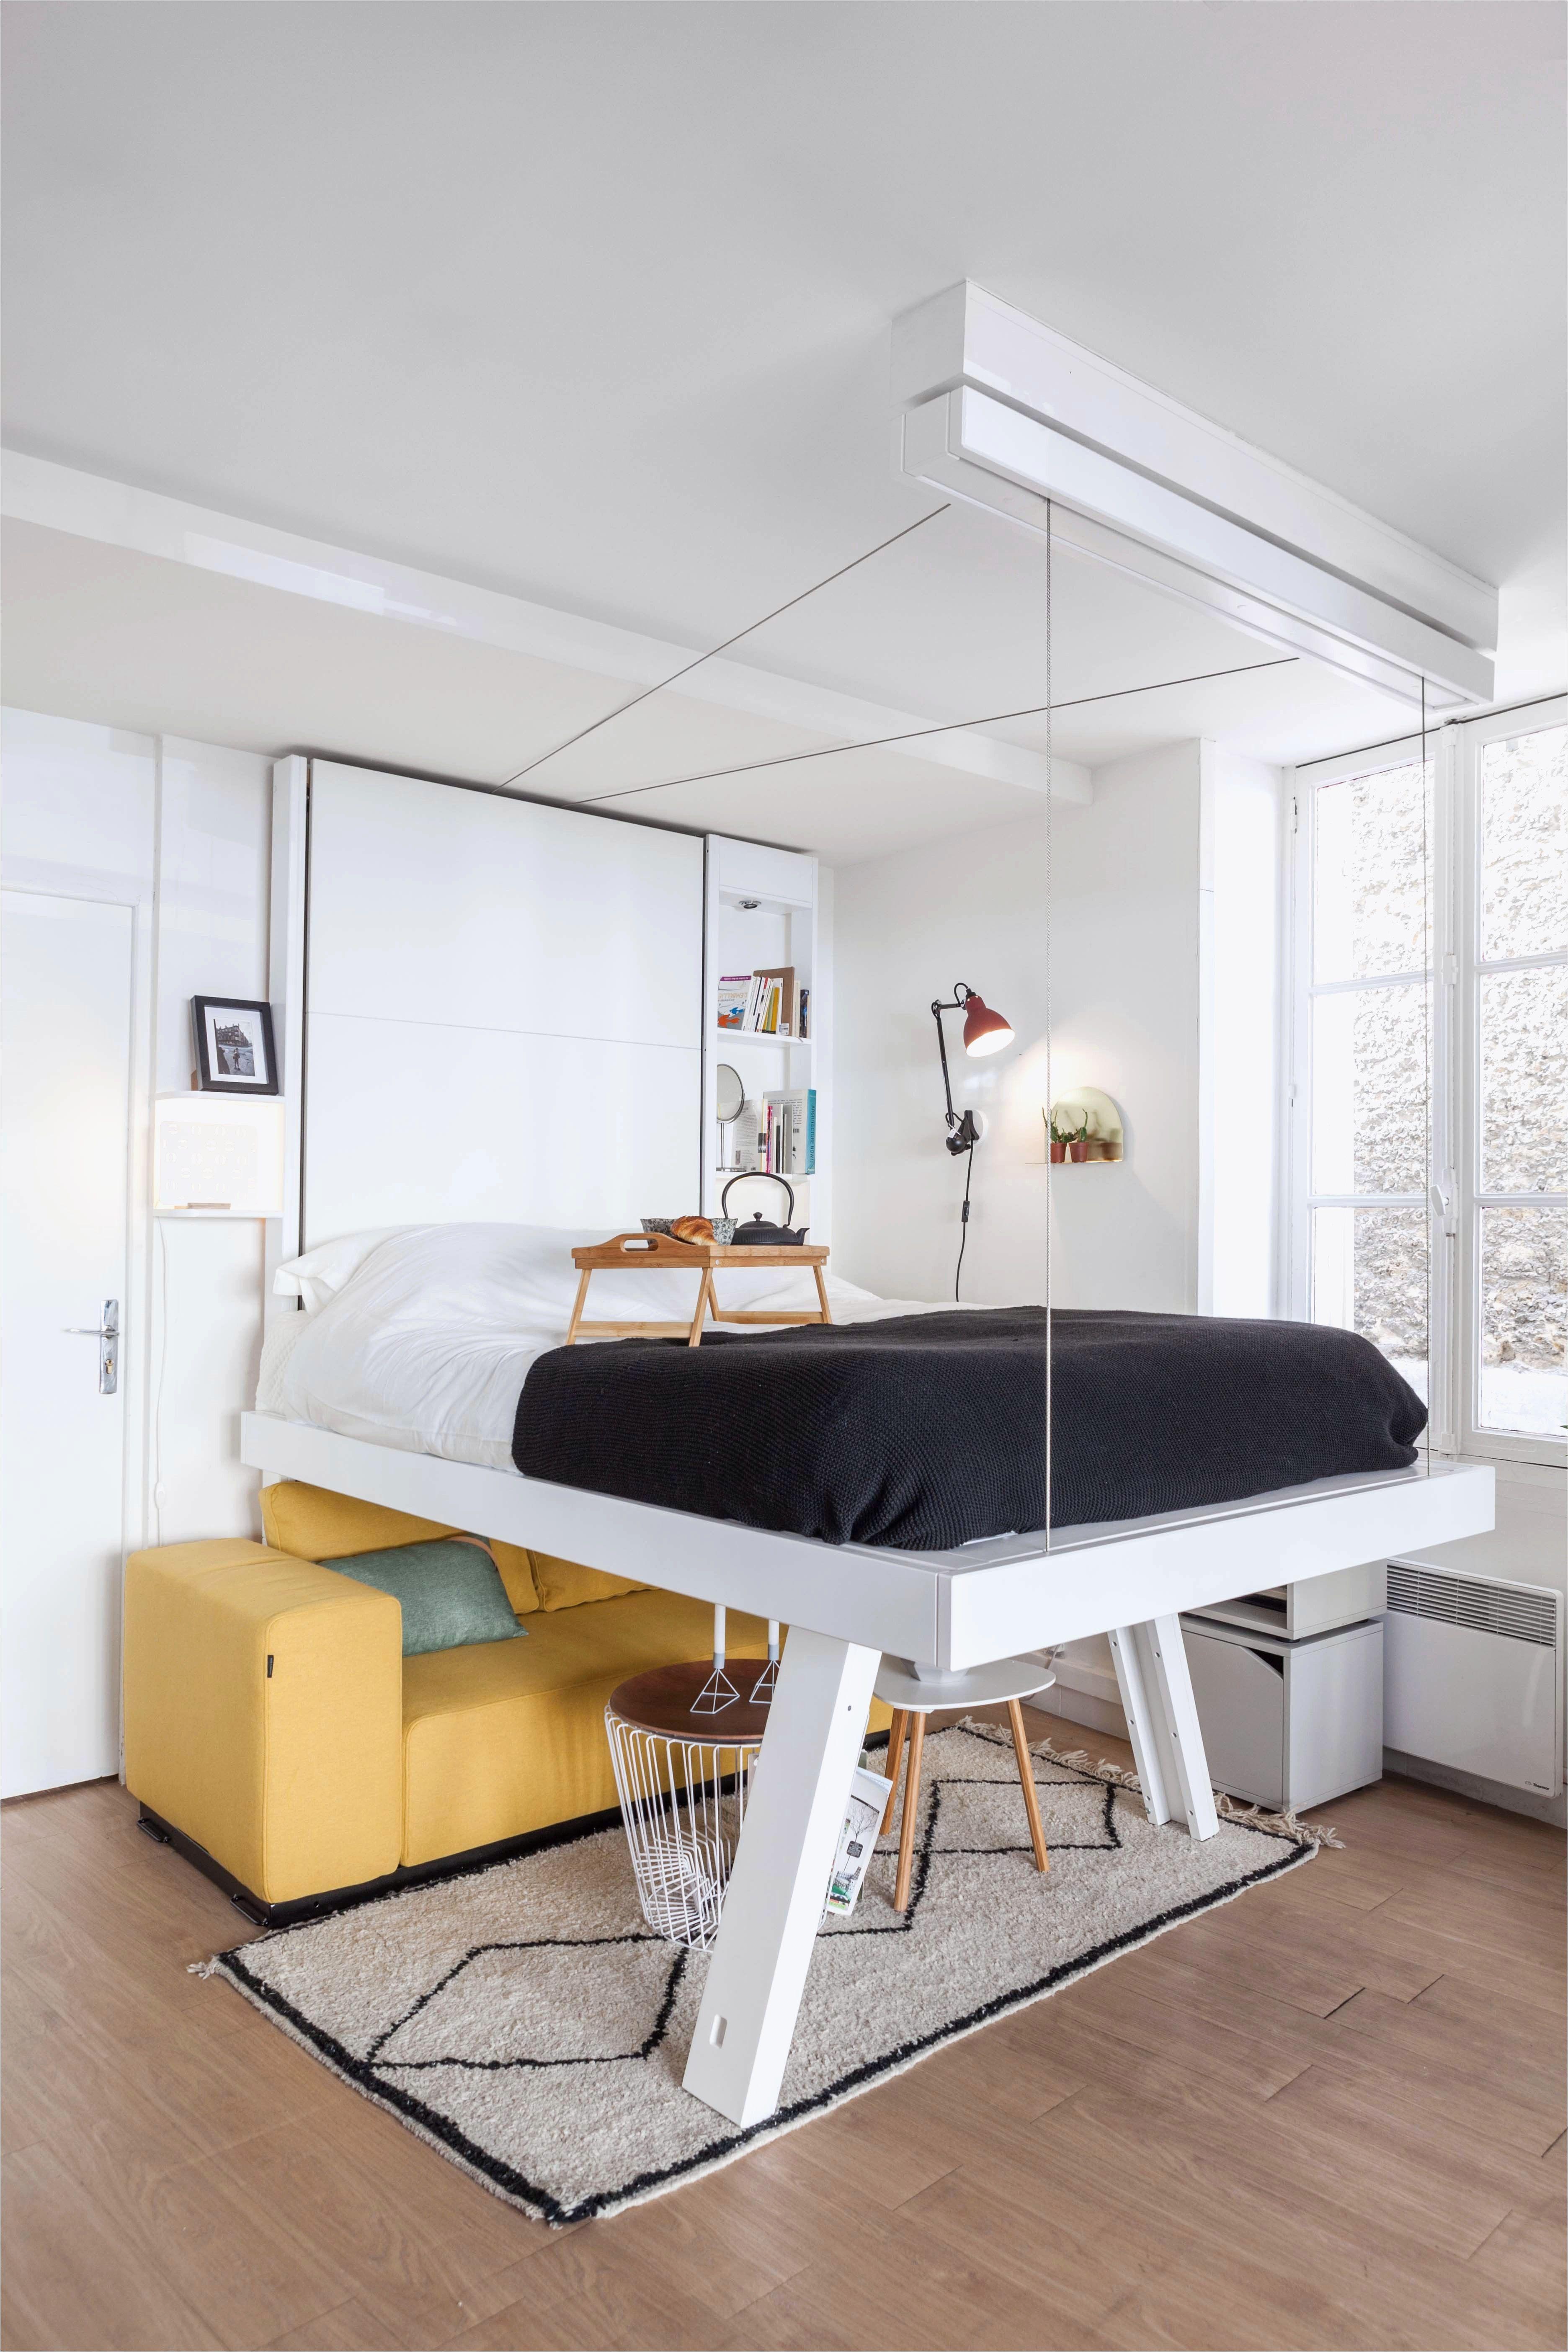 Tete De Lit Meuble Tete De Lit Design as Interior Design Awesome